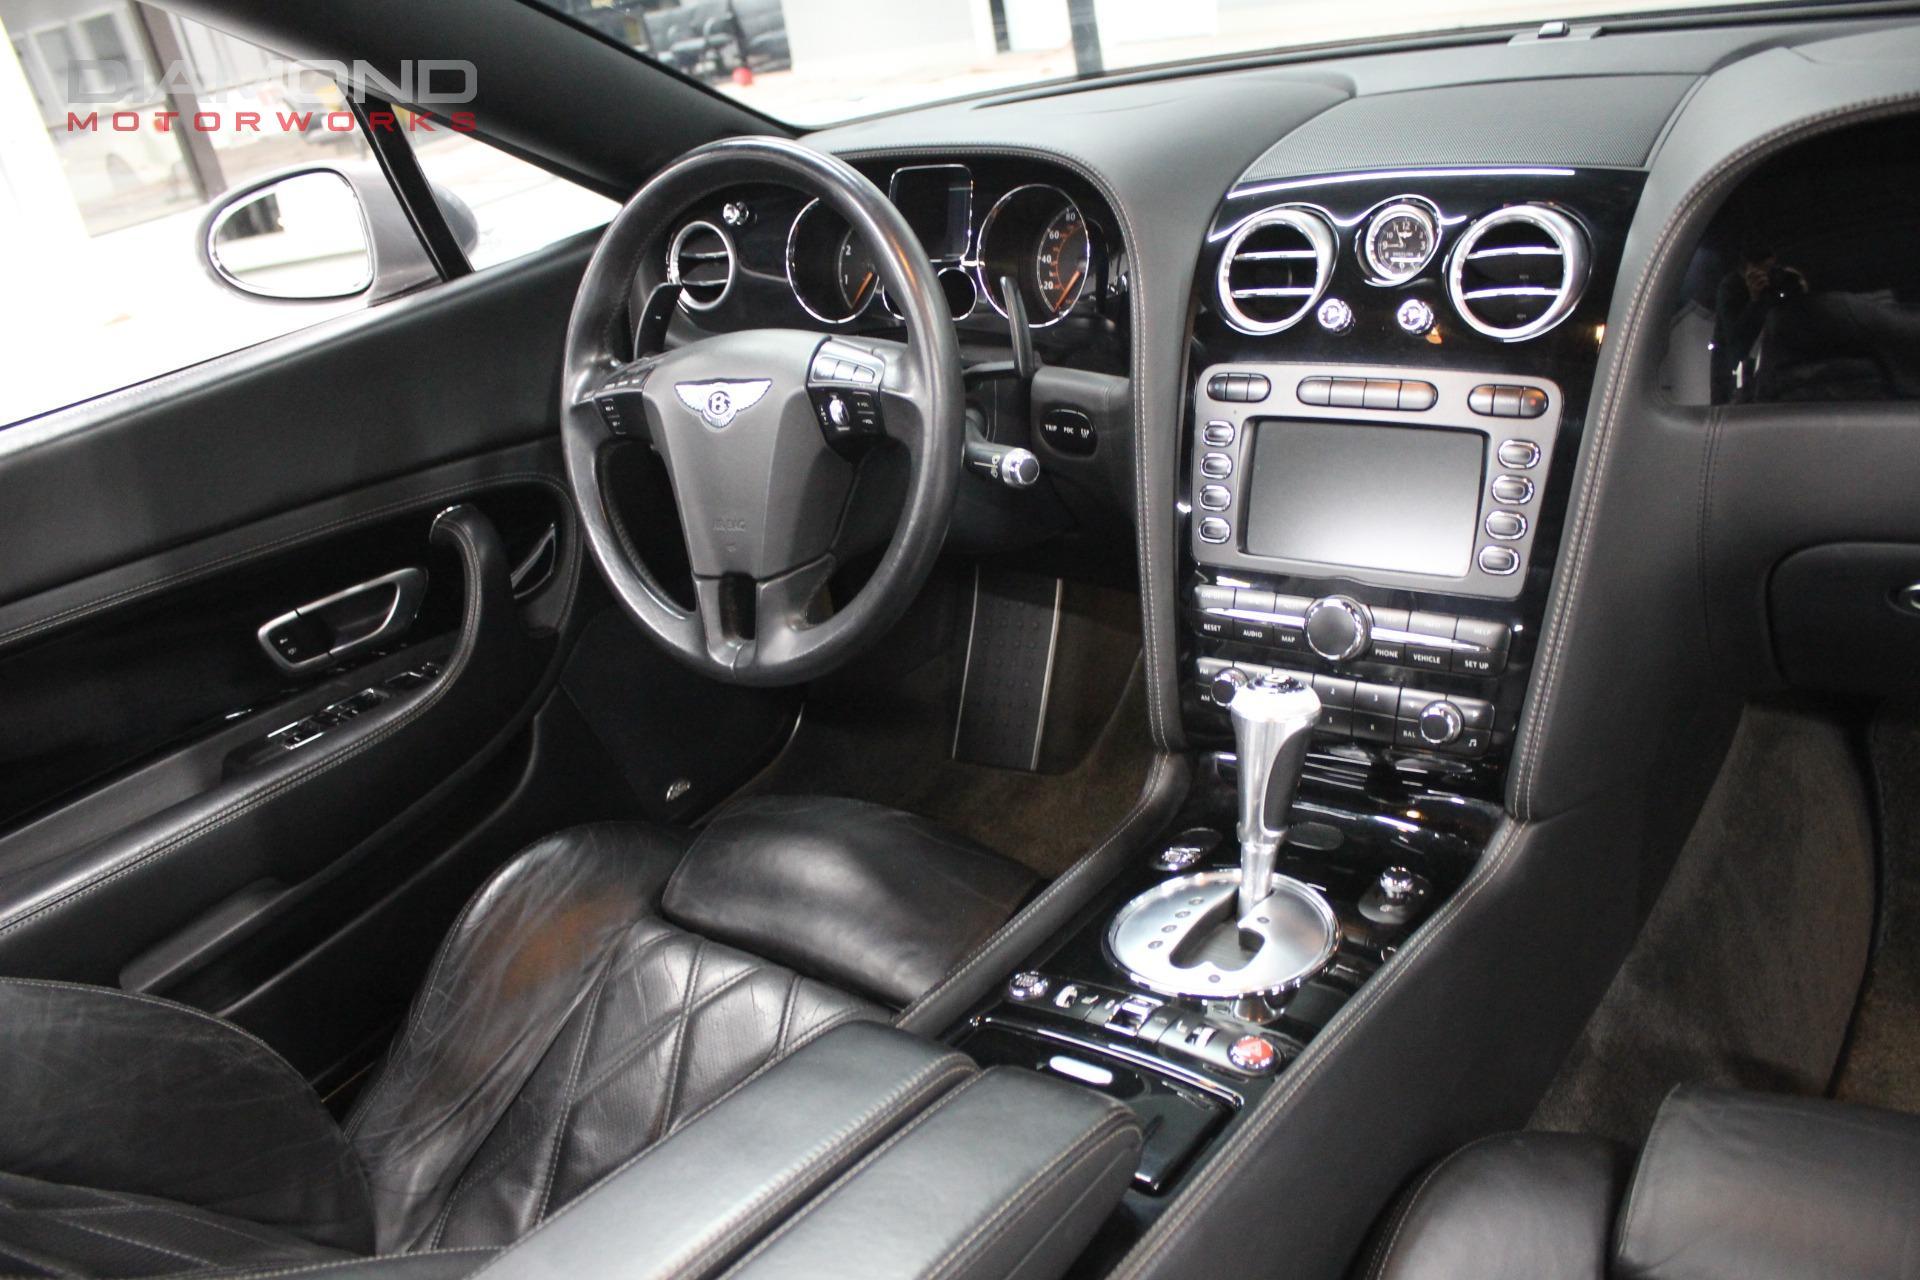 2009 Bentley Continental Gt 2dr Convertible Stock 060249